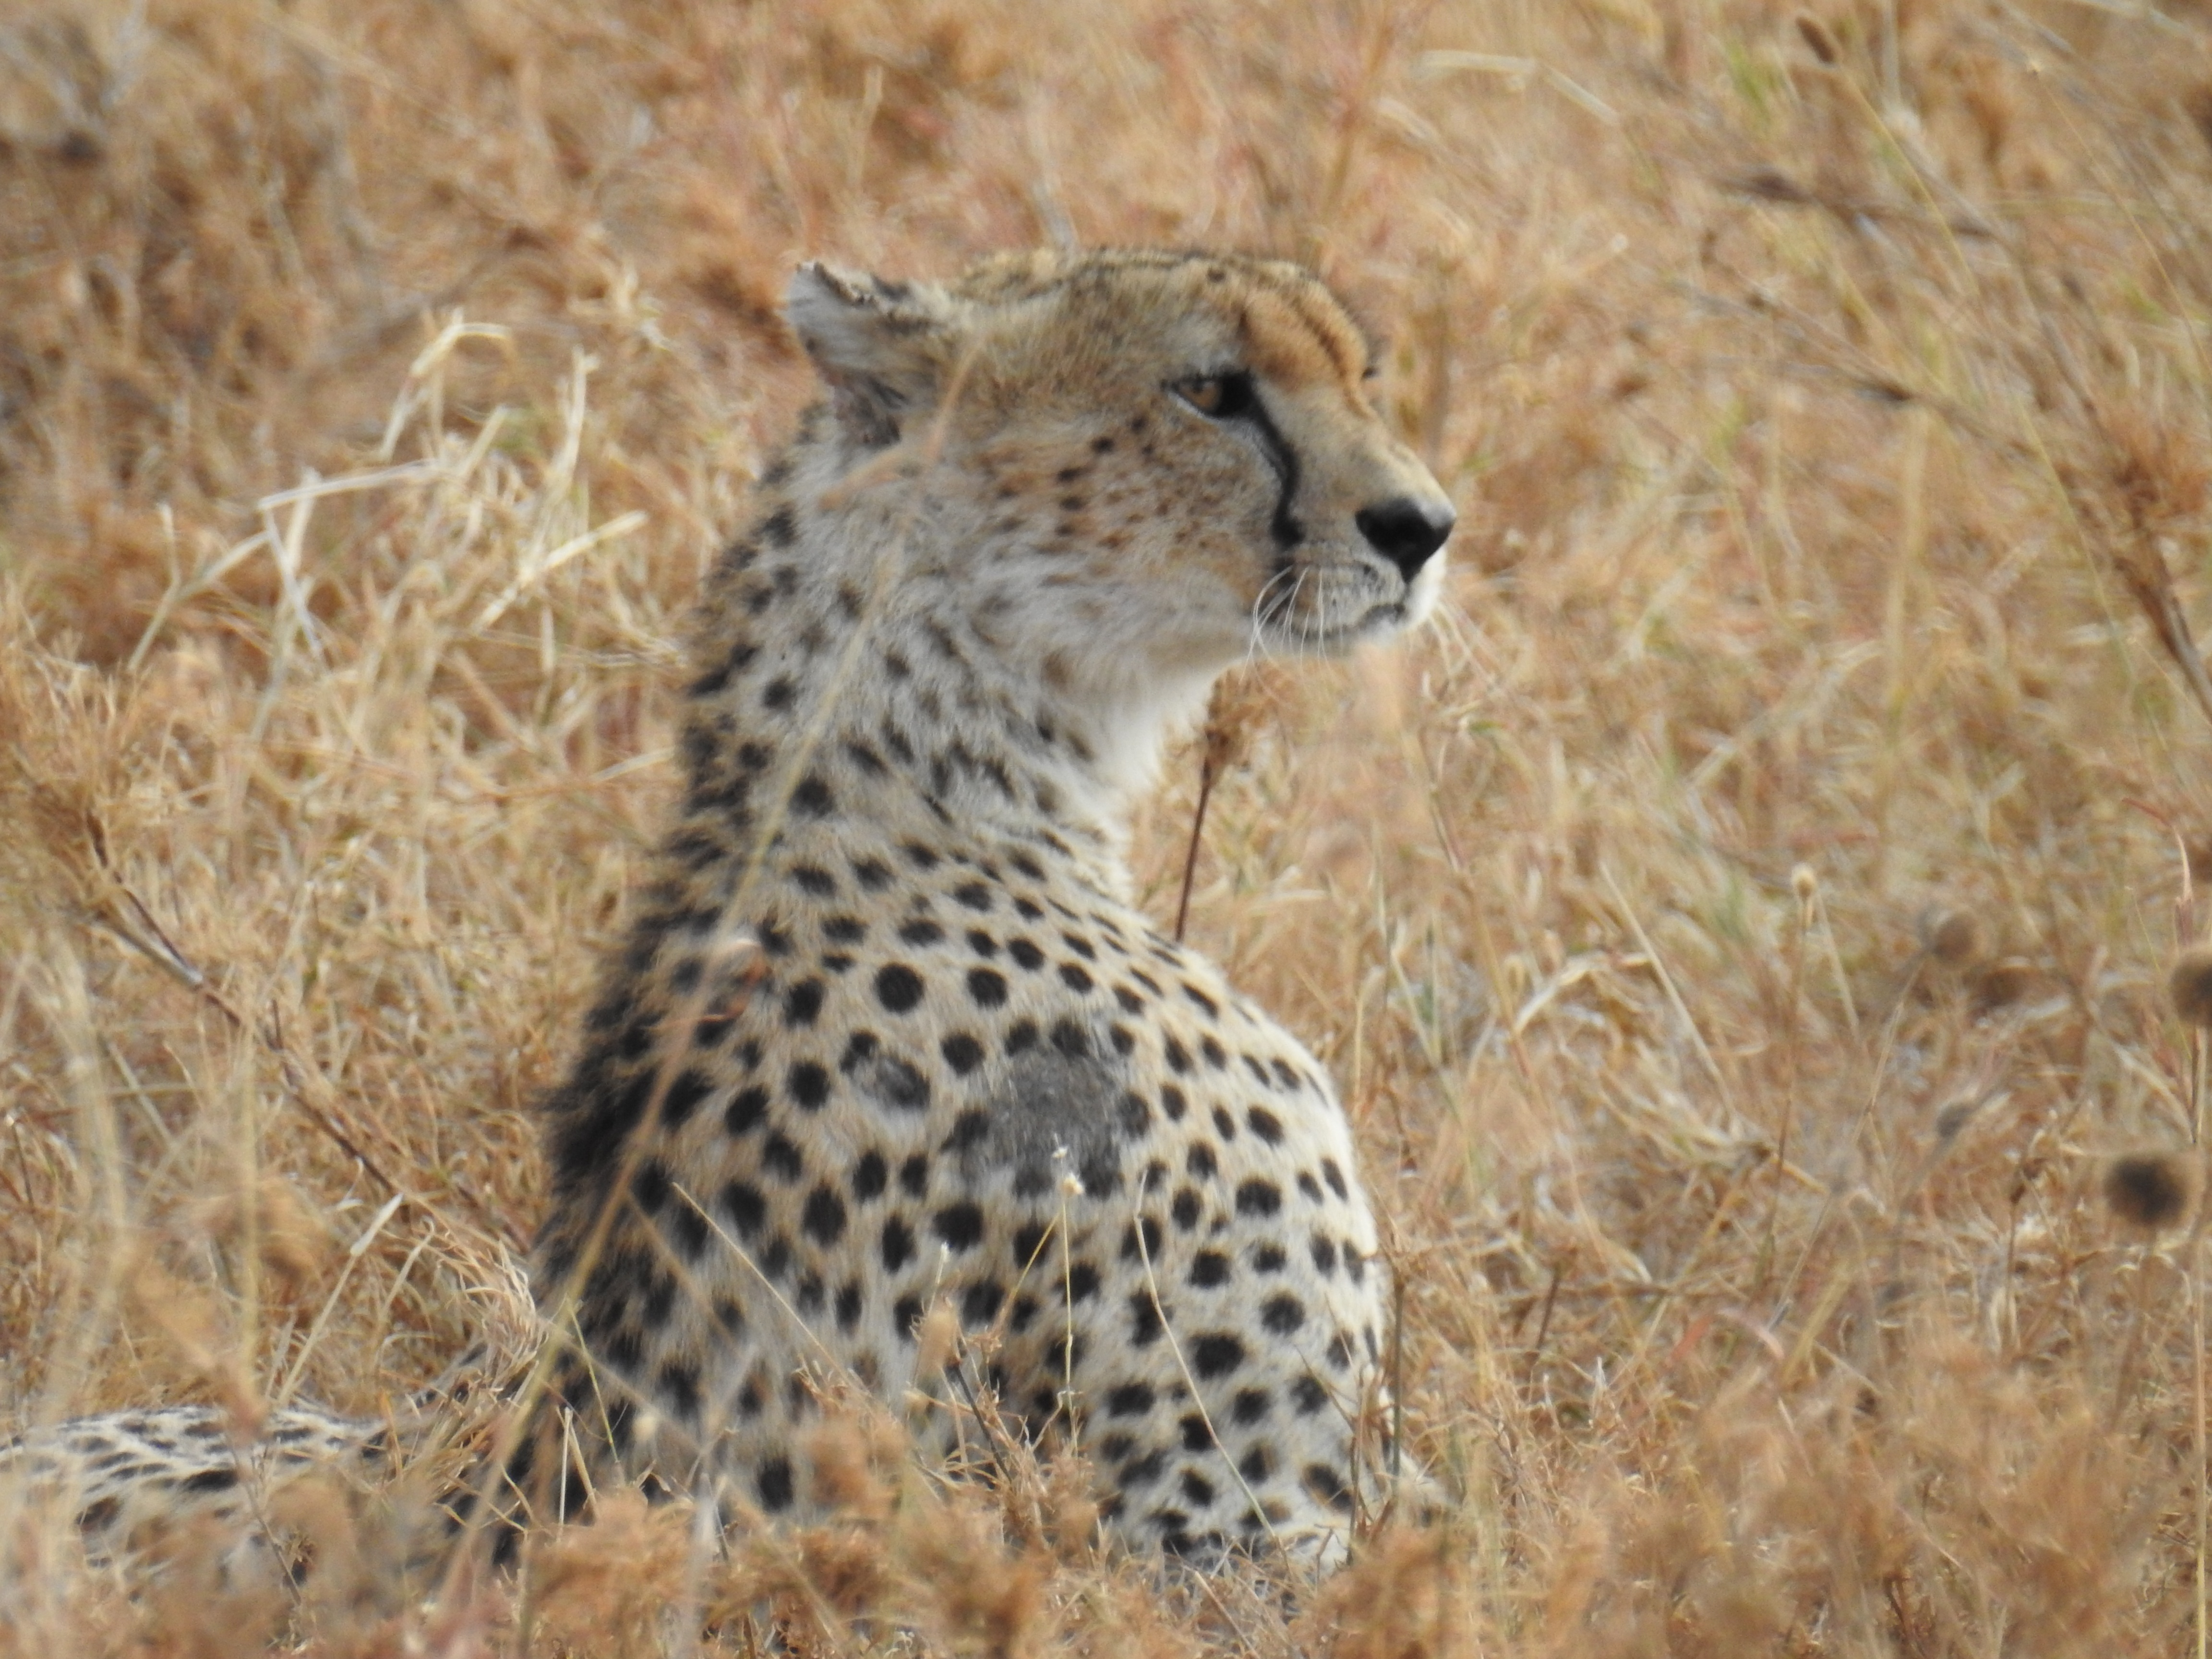 Cheetah_profile1.jpg